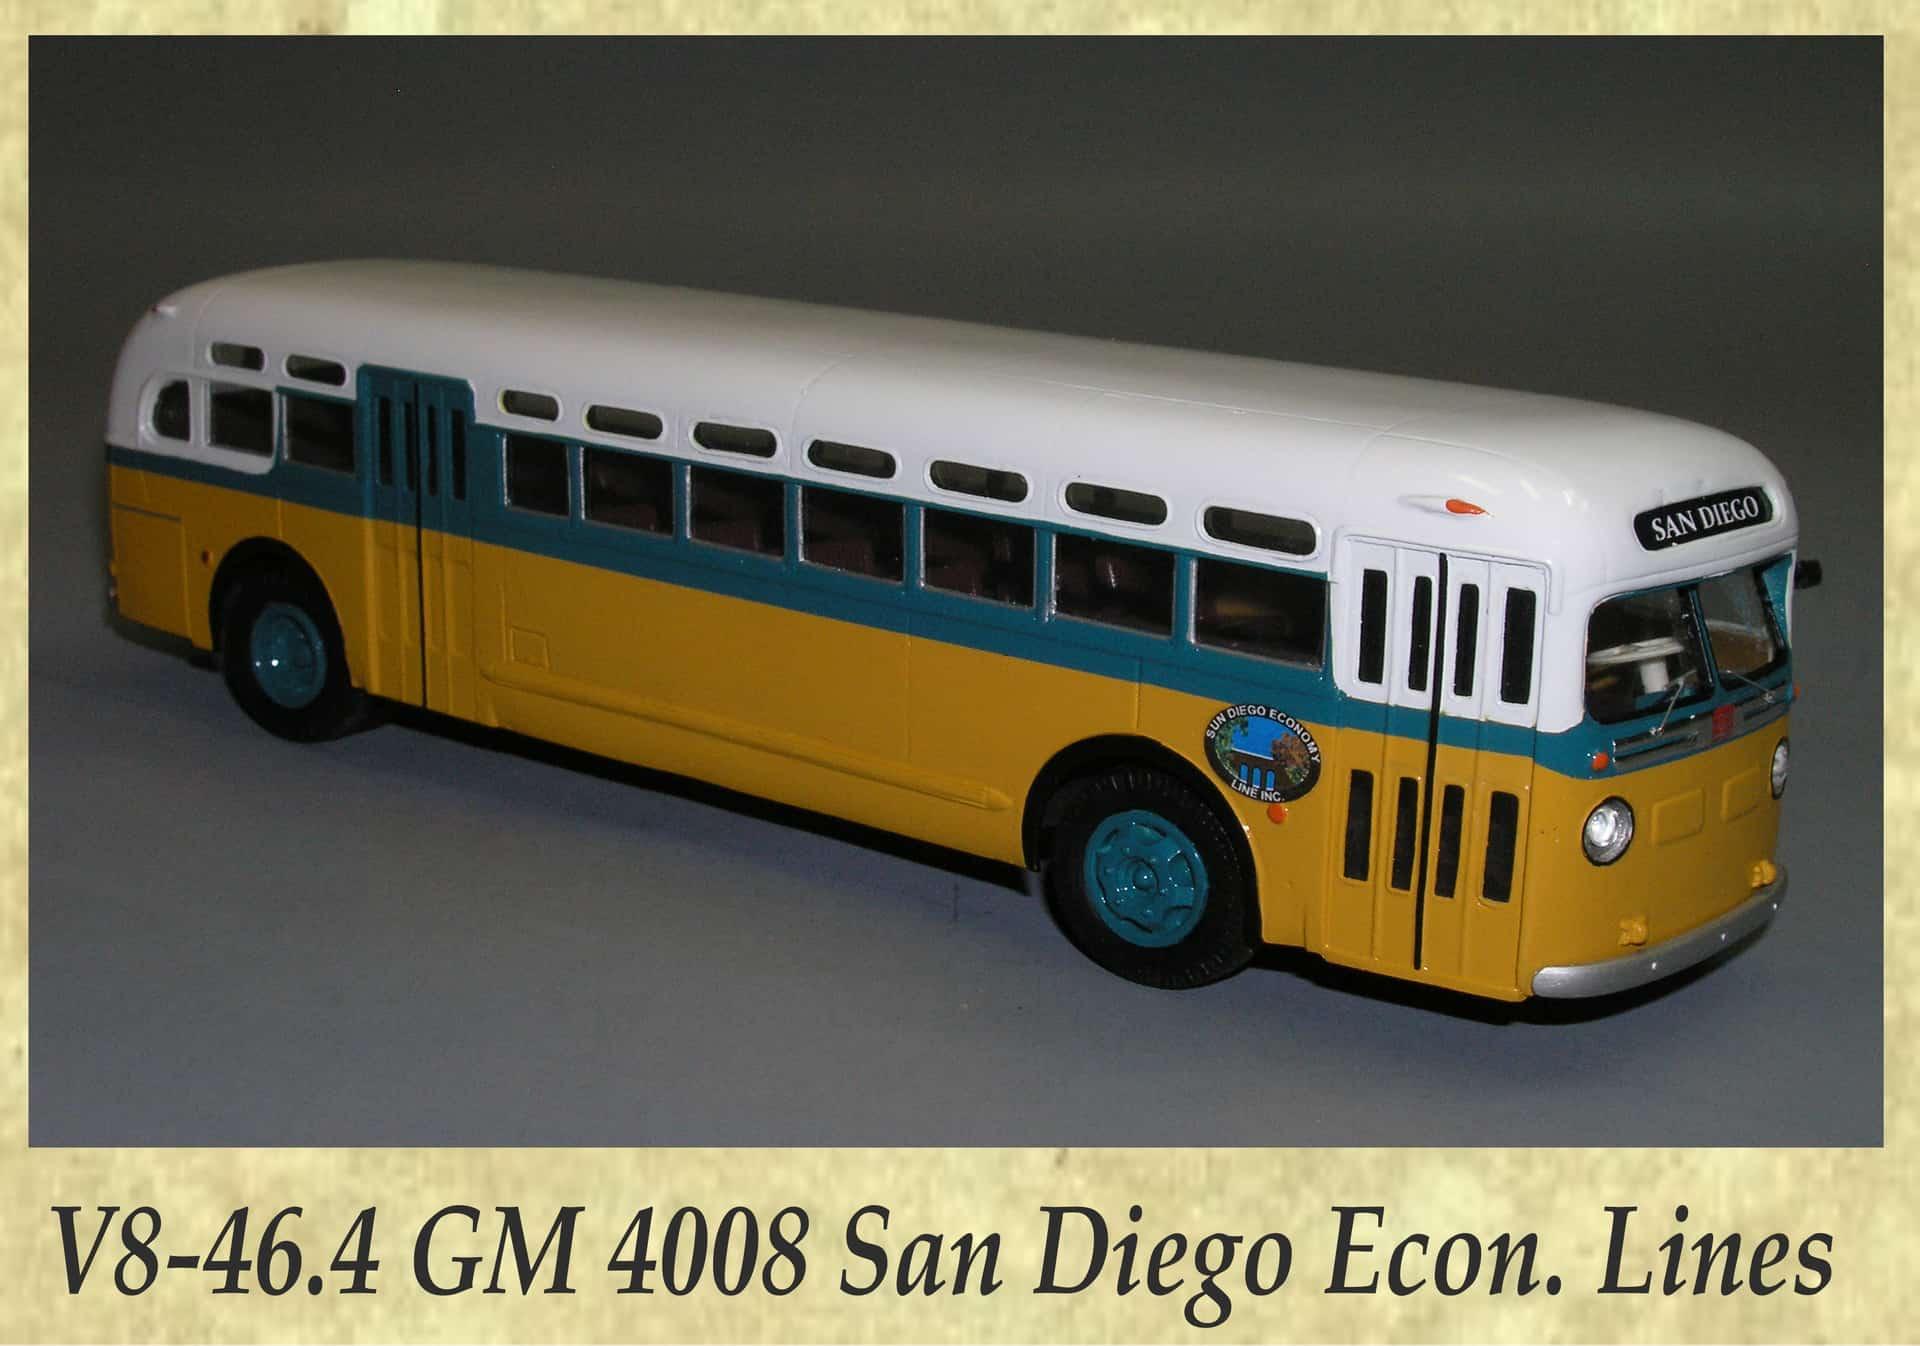 V8-46.4 GM 4008 San Diego Econ. Lines